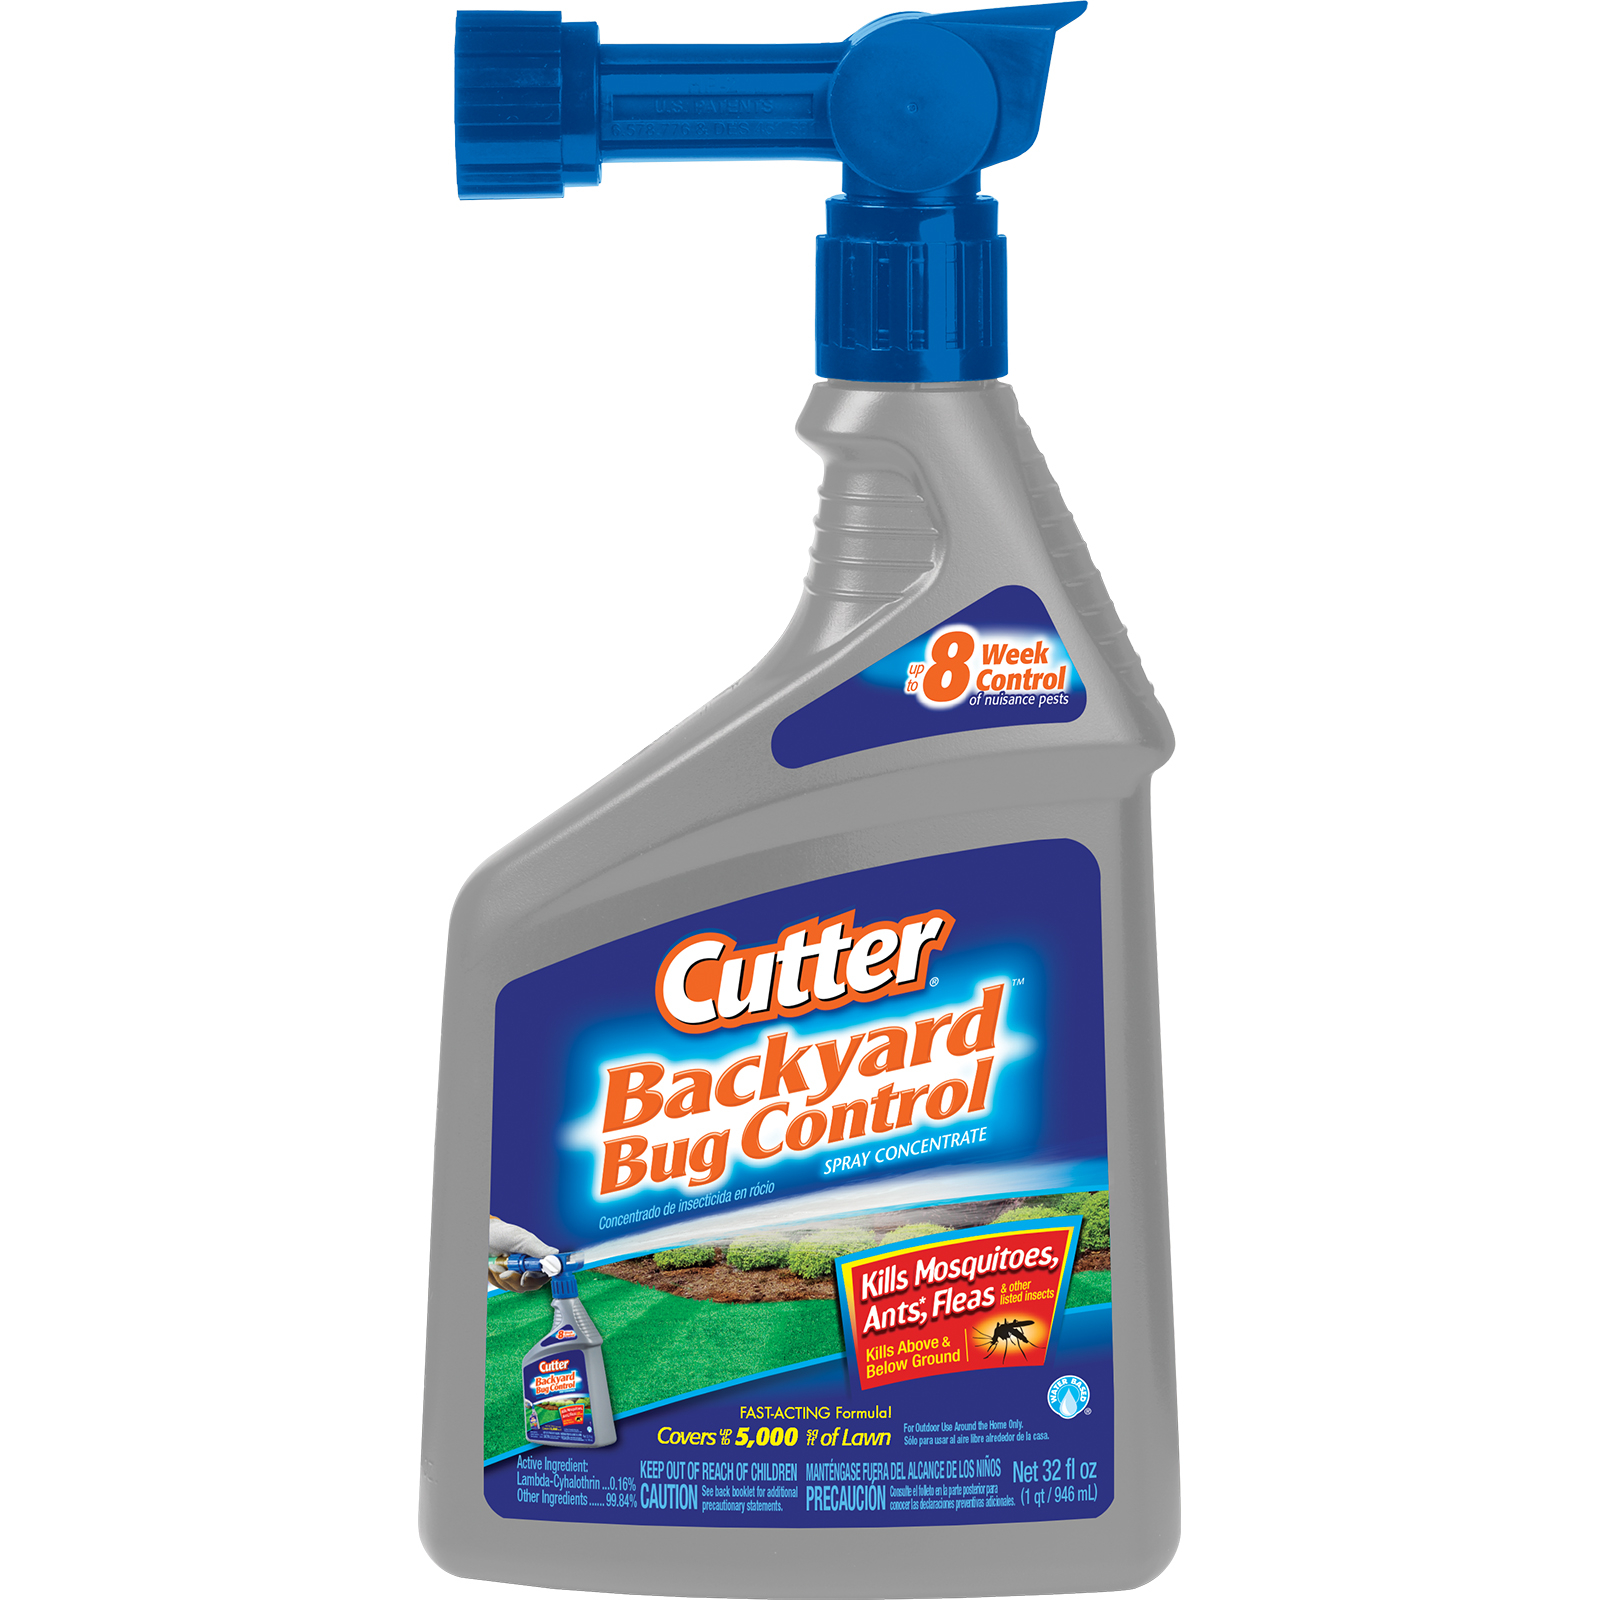 Cutter 61067 Backyard Bug Control, Spray Concentrate, 32